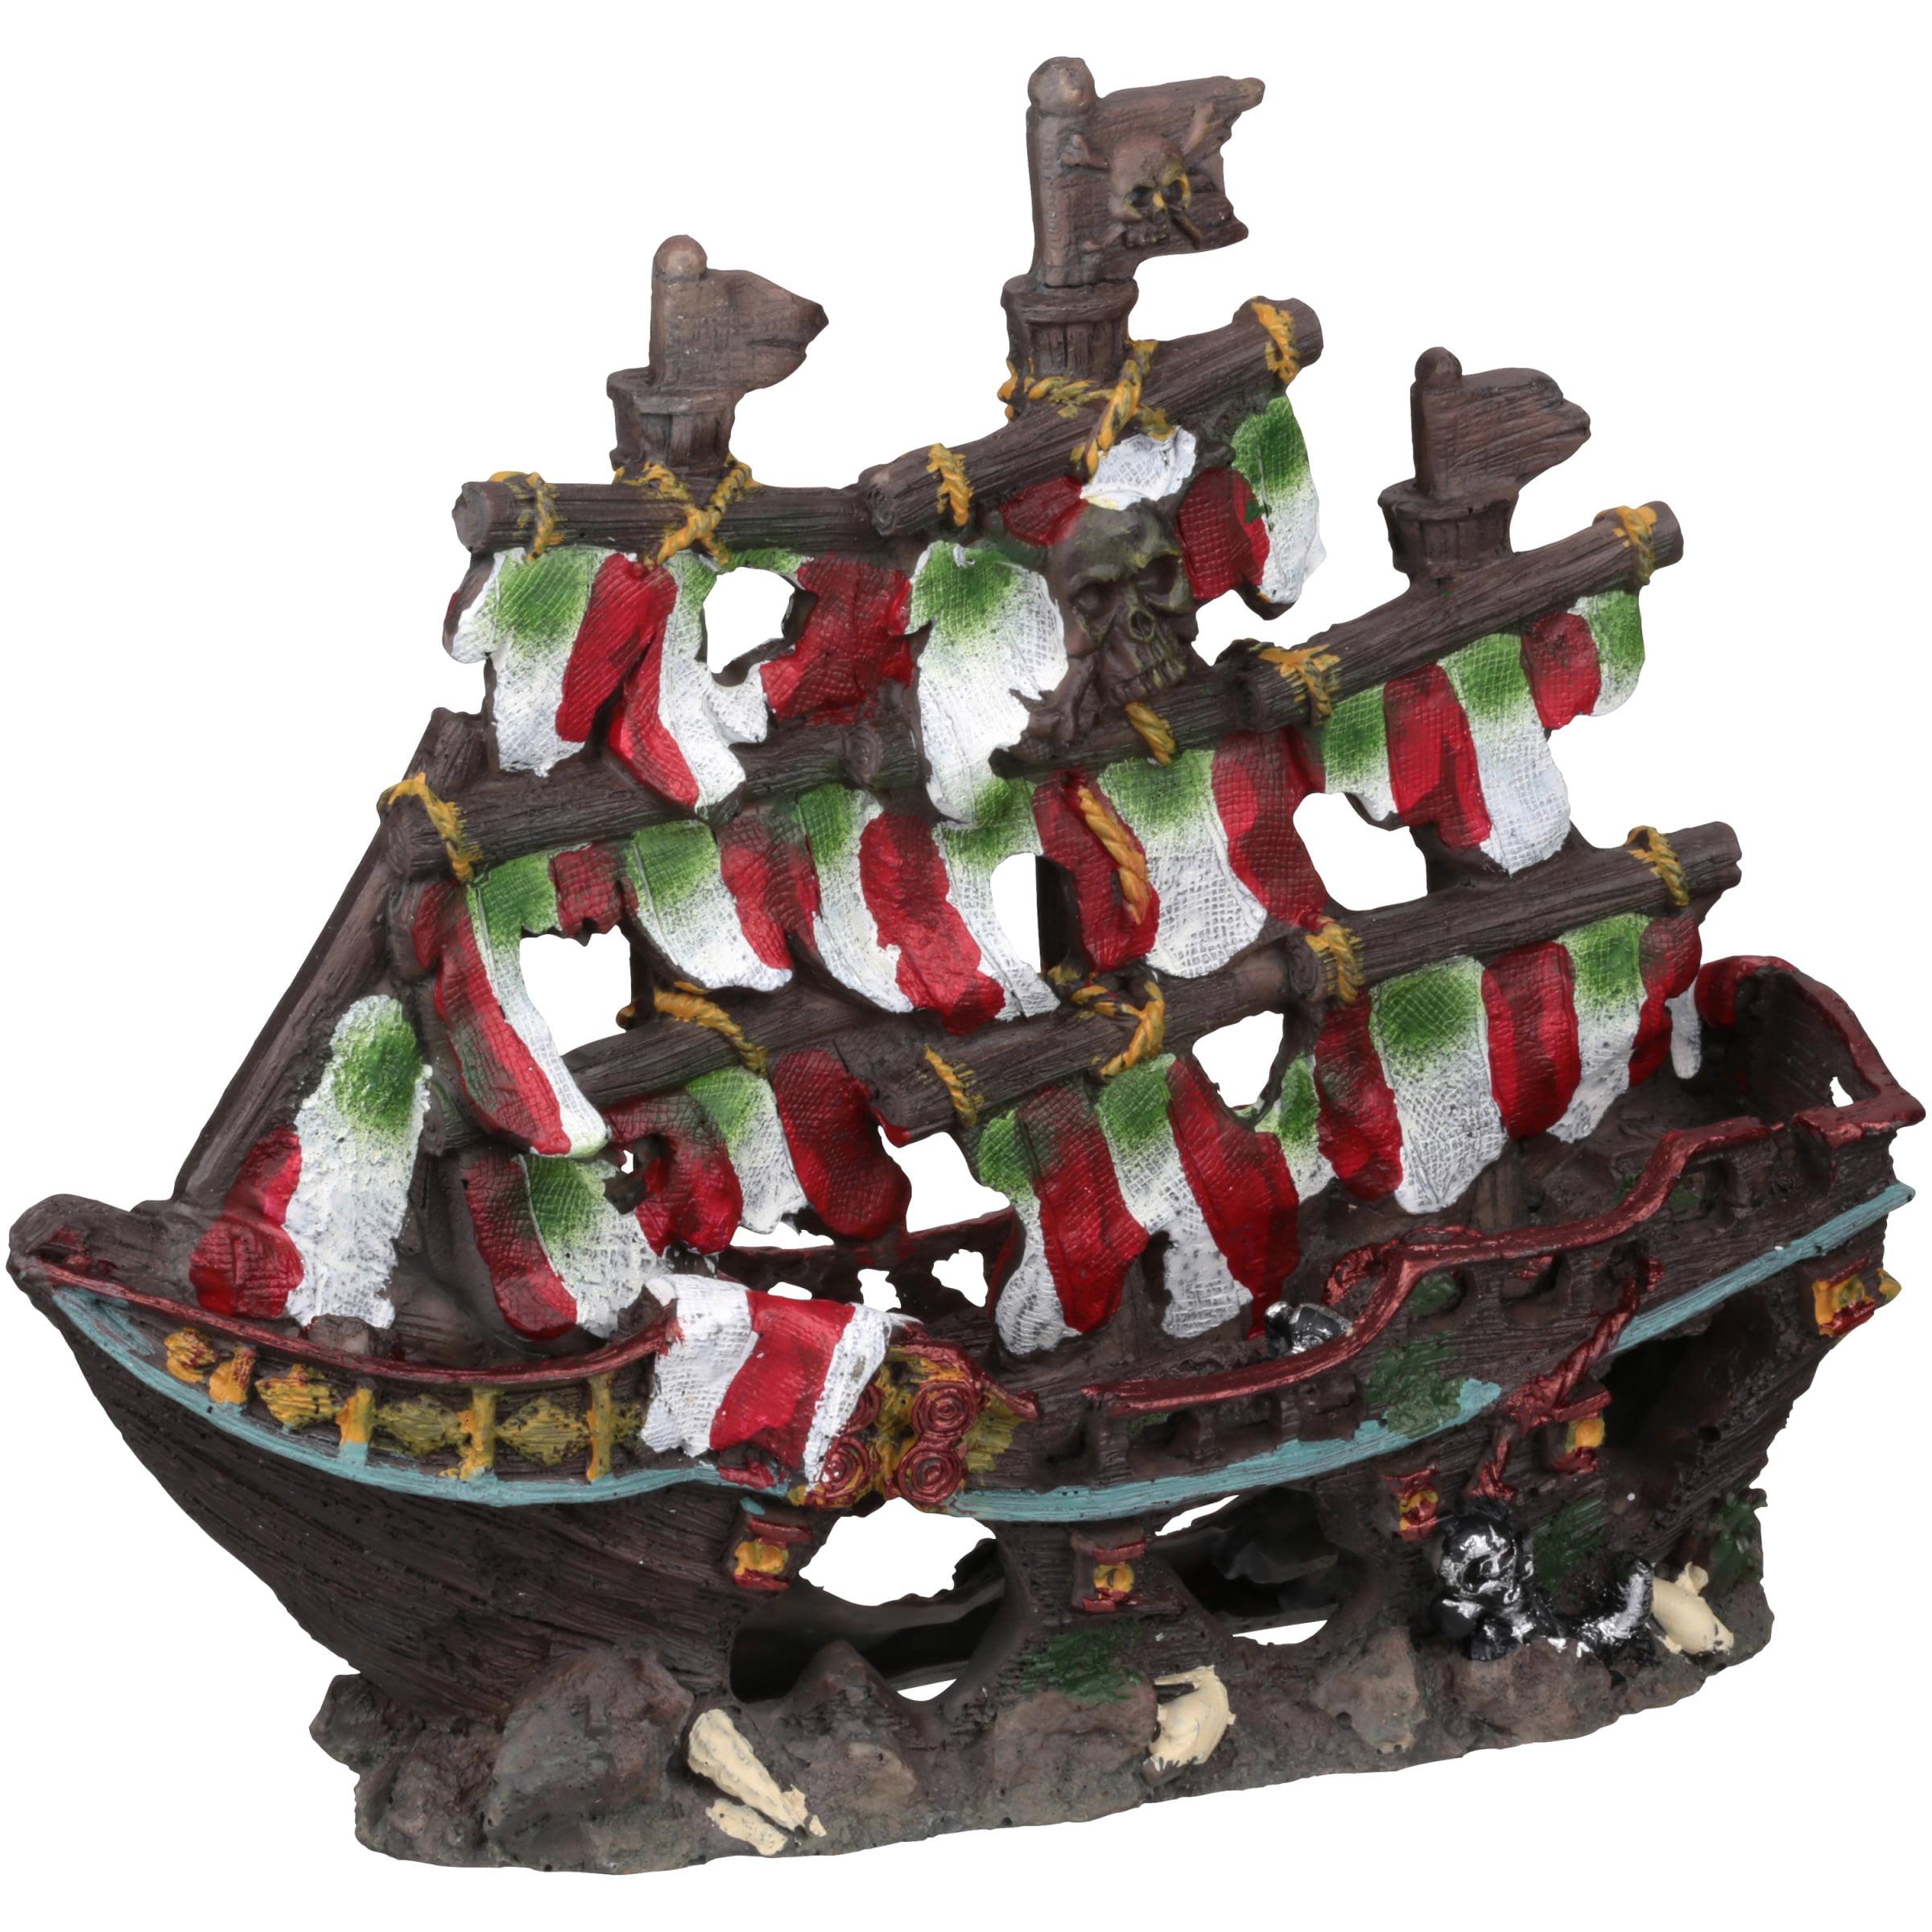 Penn Plax Deco Replicas Striped Pirate Ship Aquarium Ornament